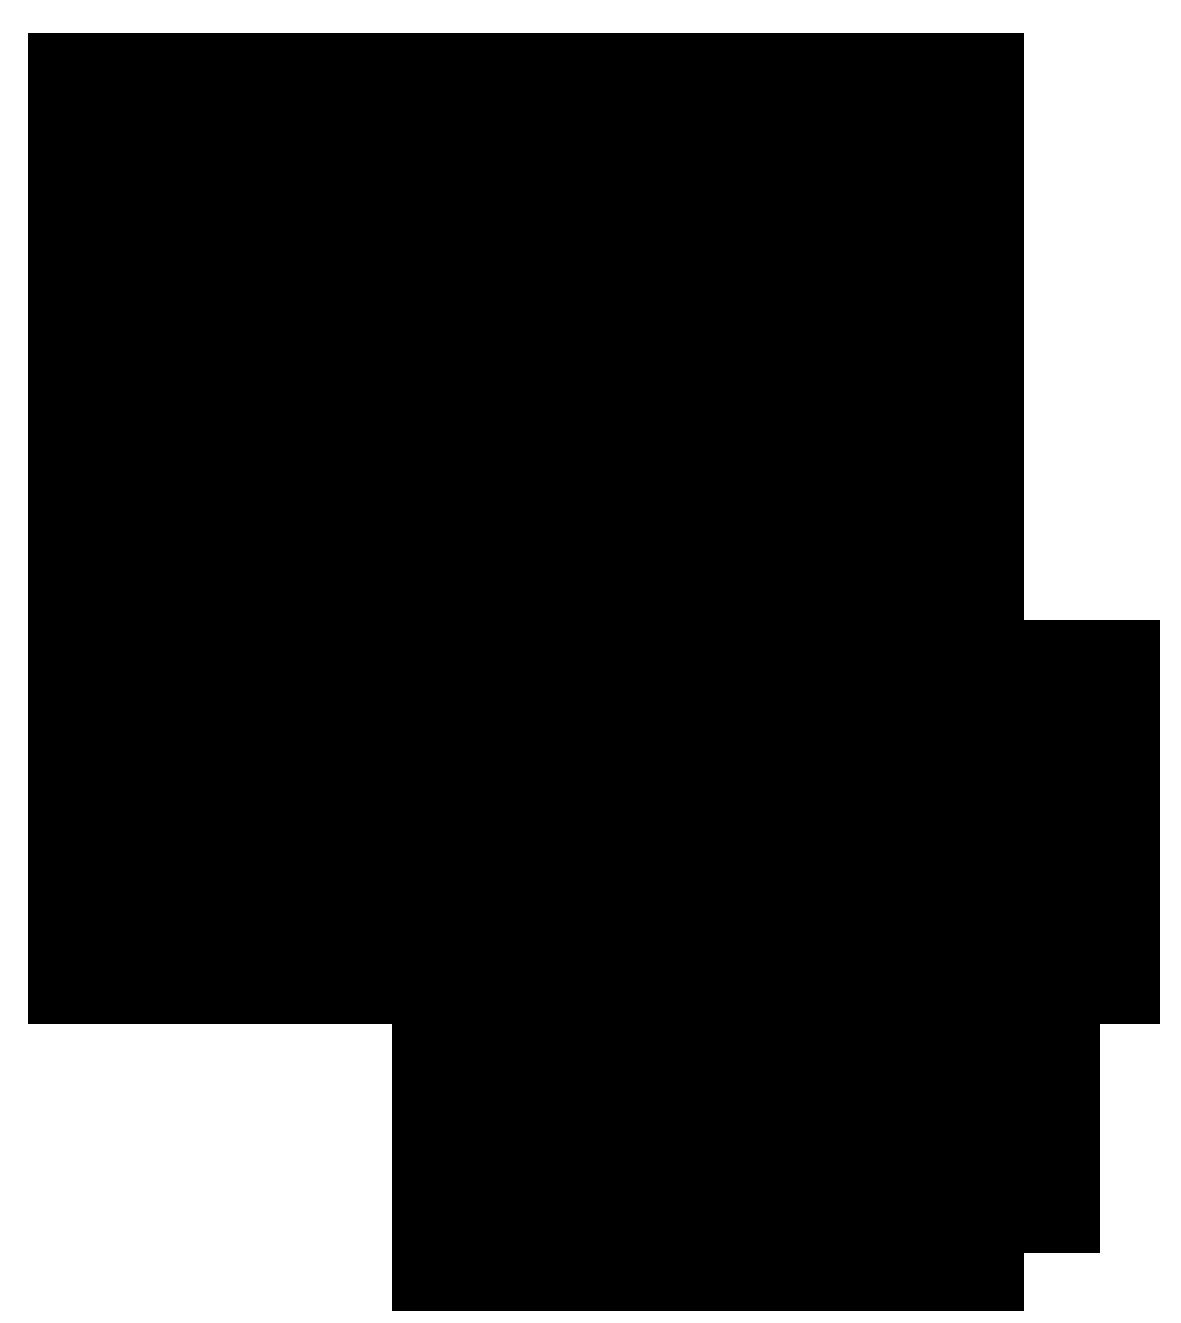 1181x1323 Christmas Silhouettes